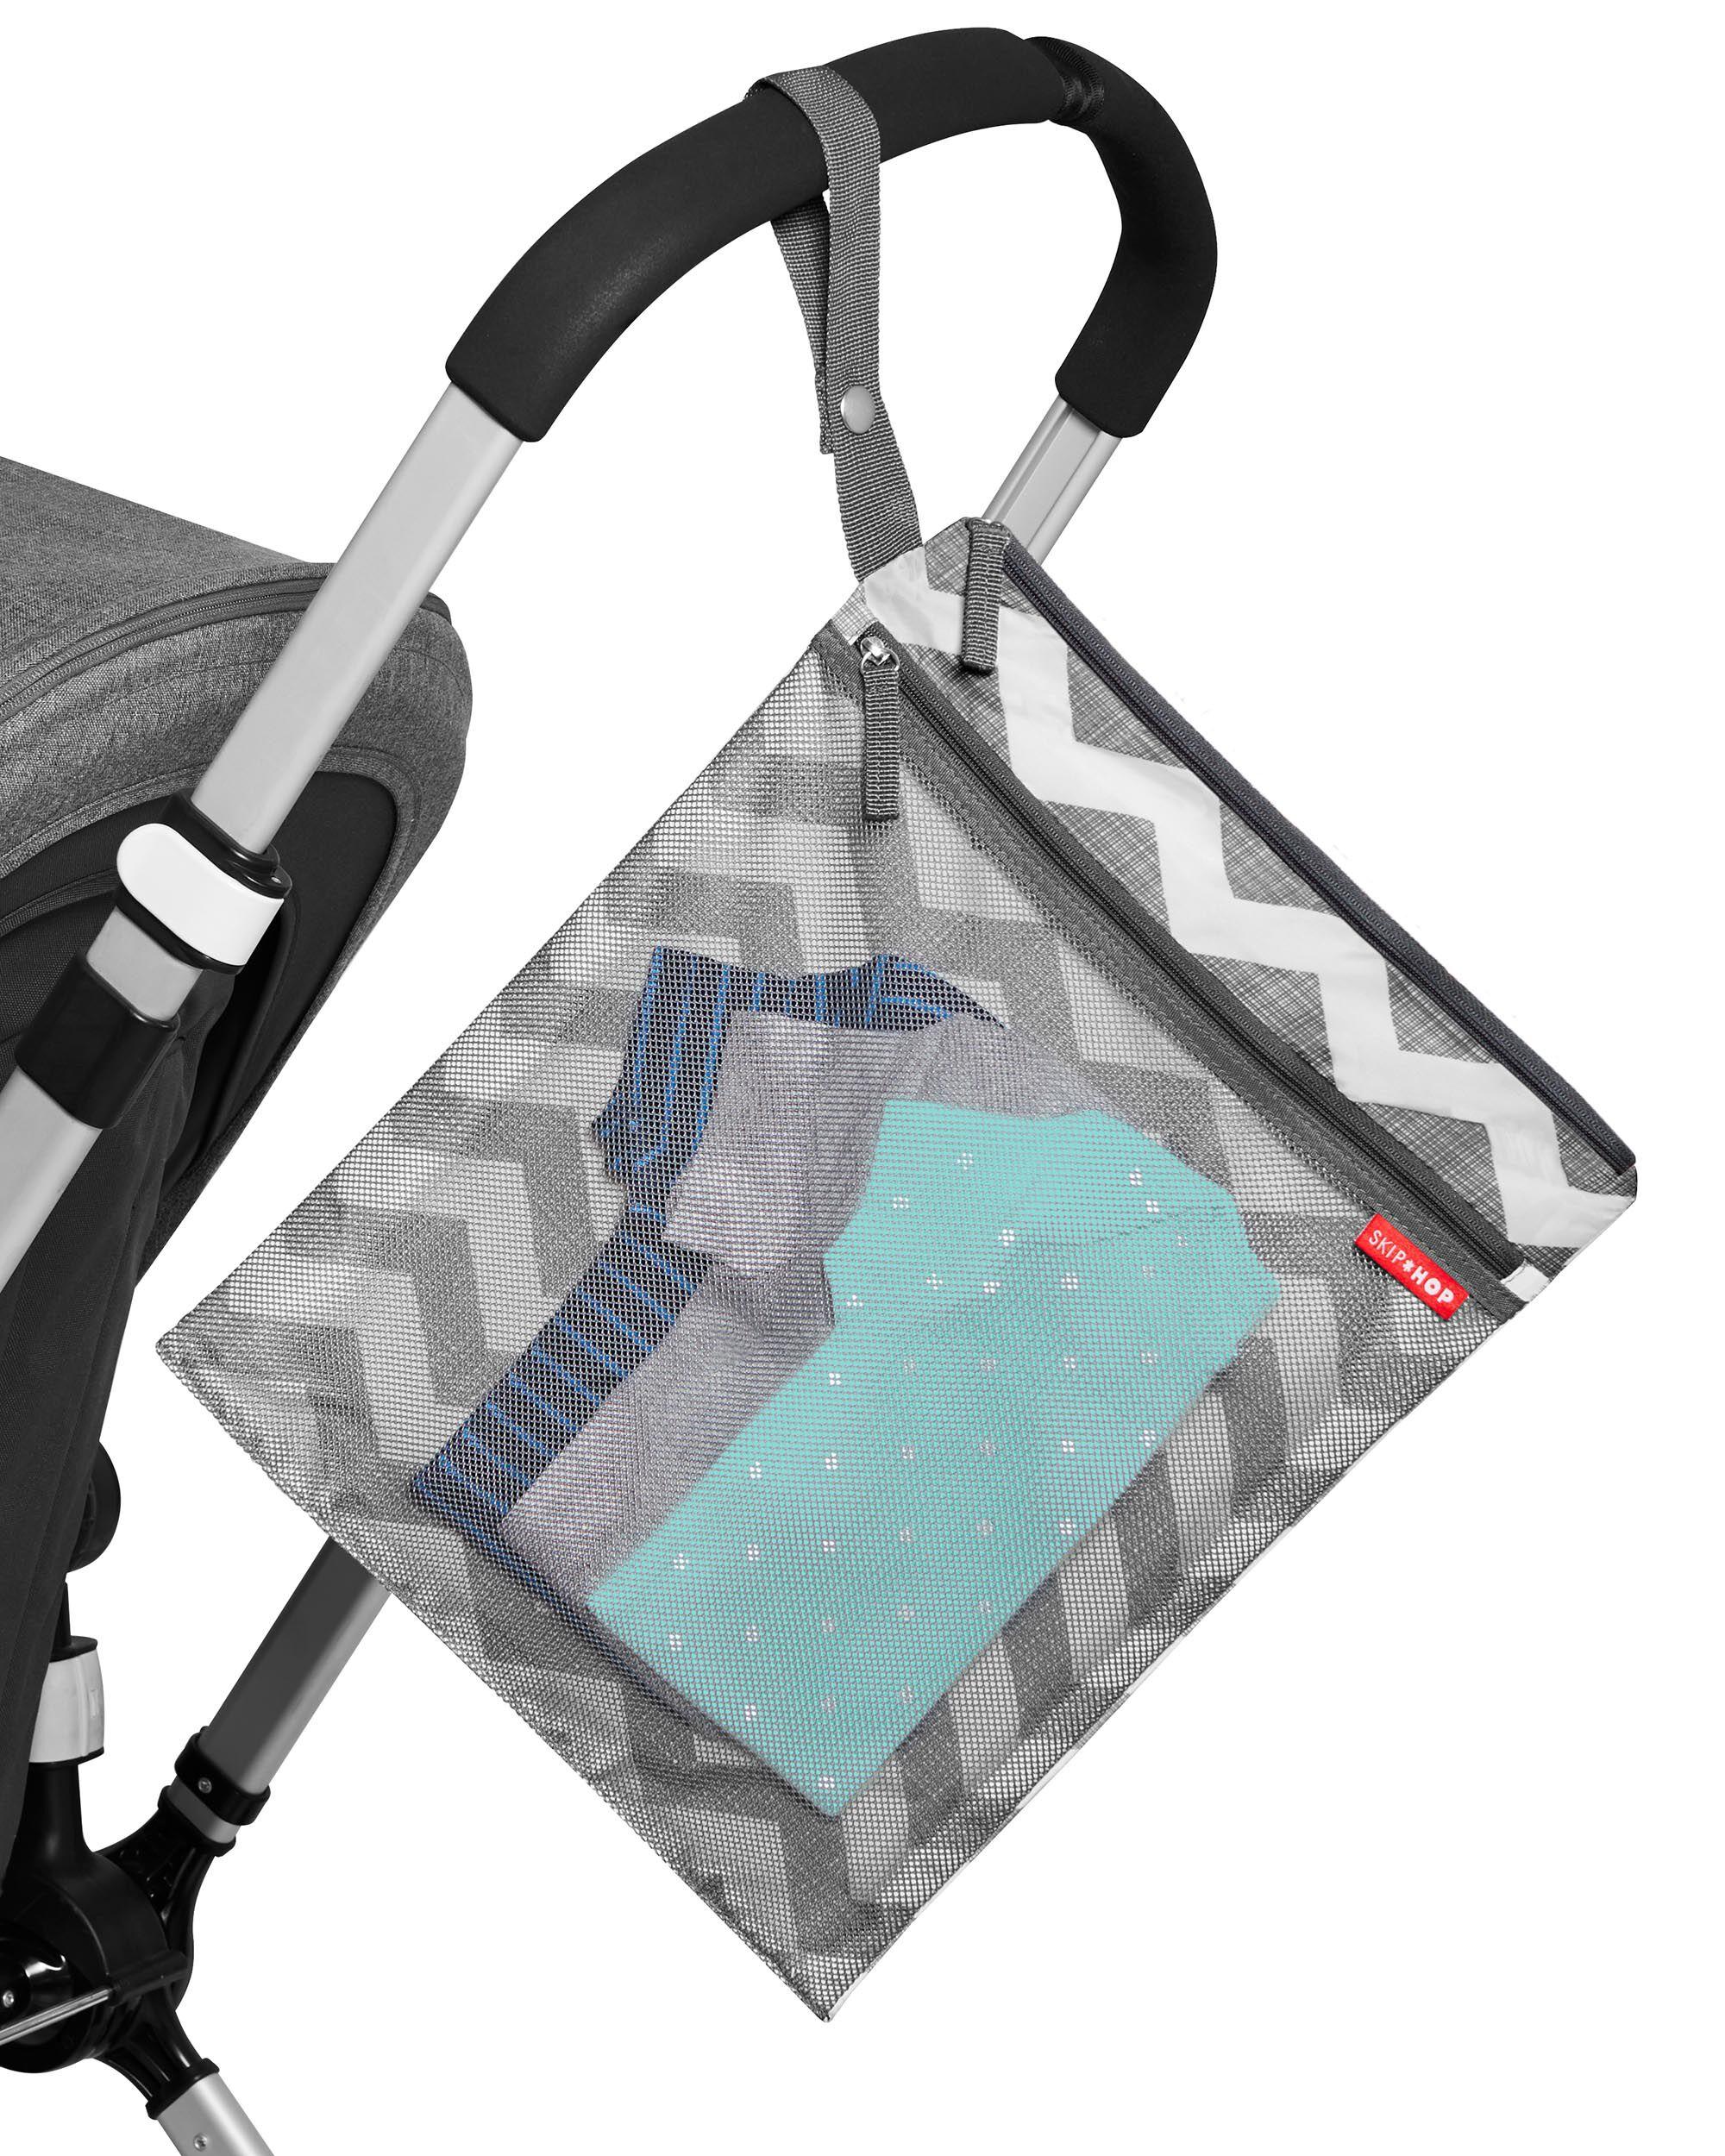 Grab Go Wet Dry Bag